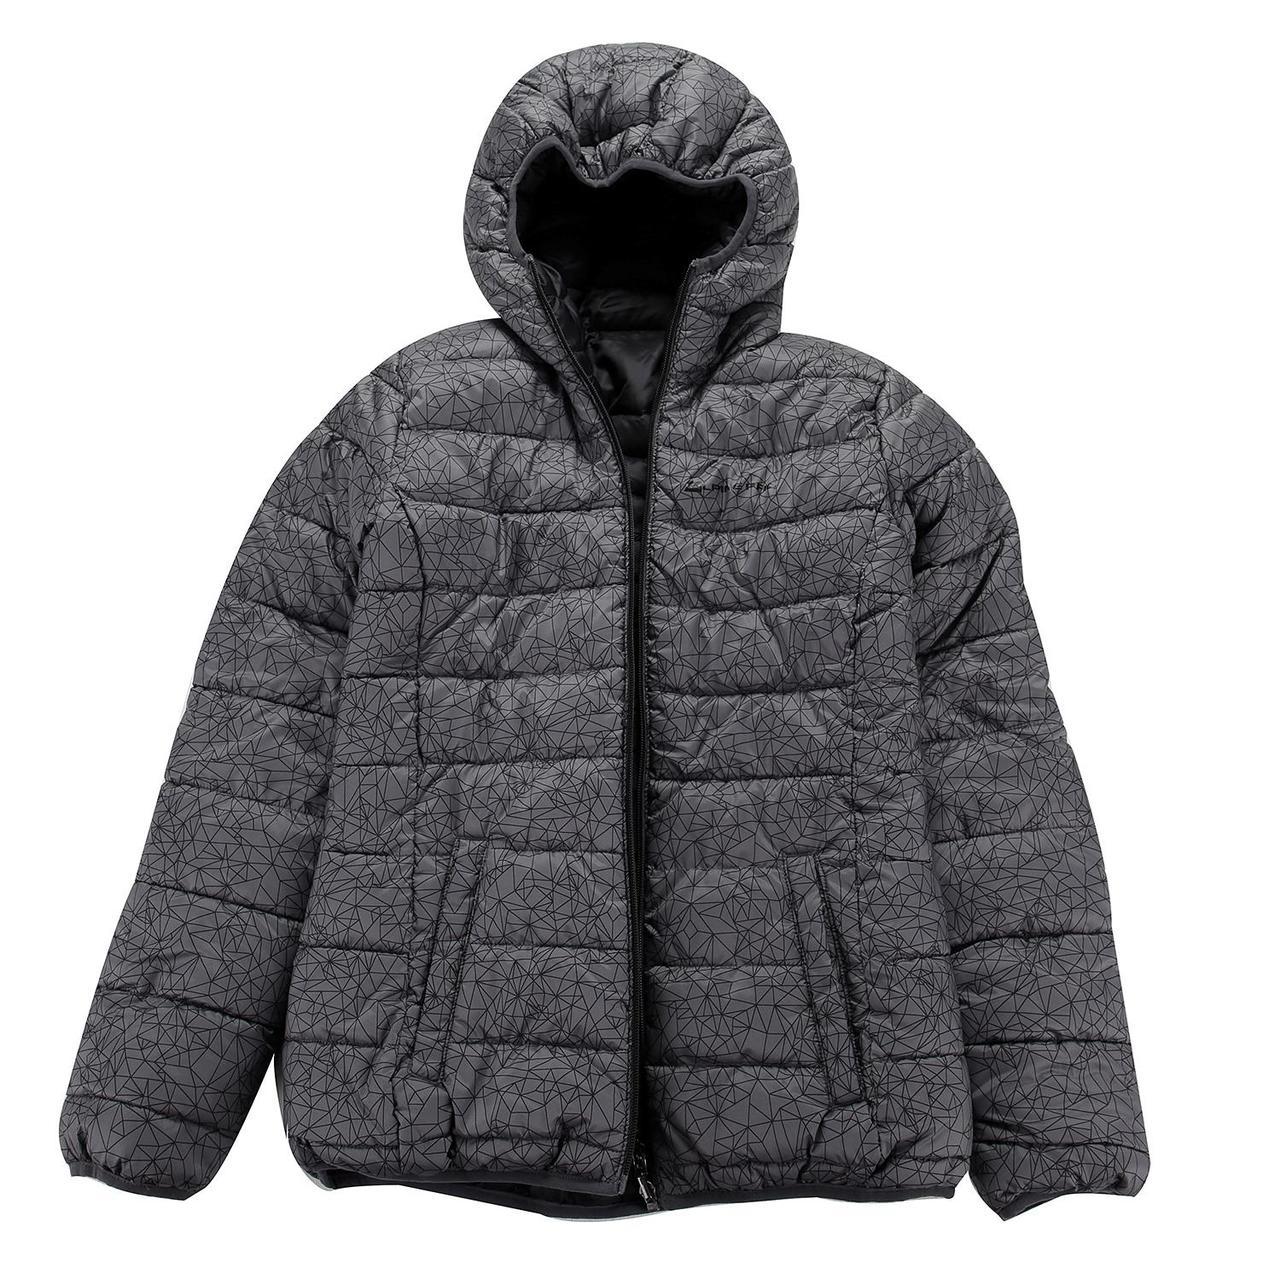 Куртка MUNSRA 5 - фото 6